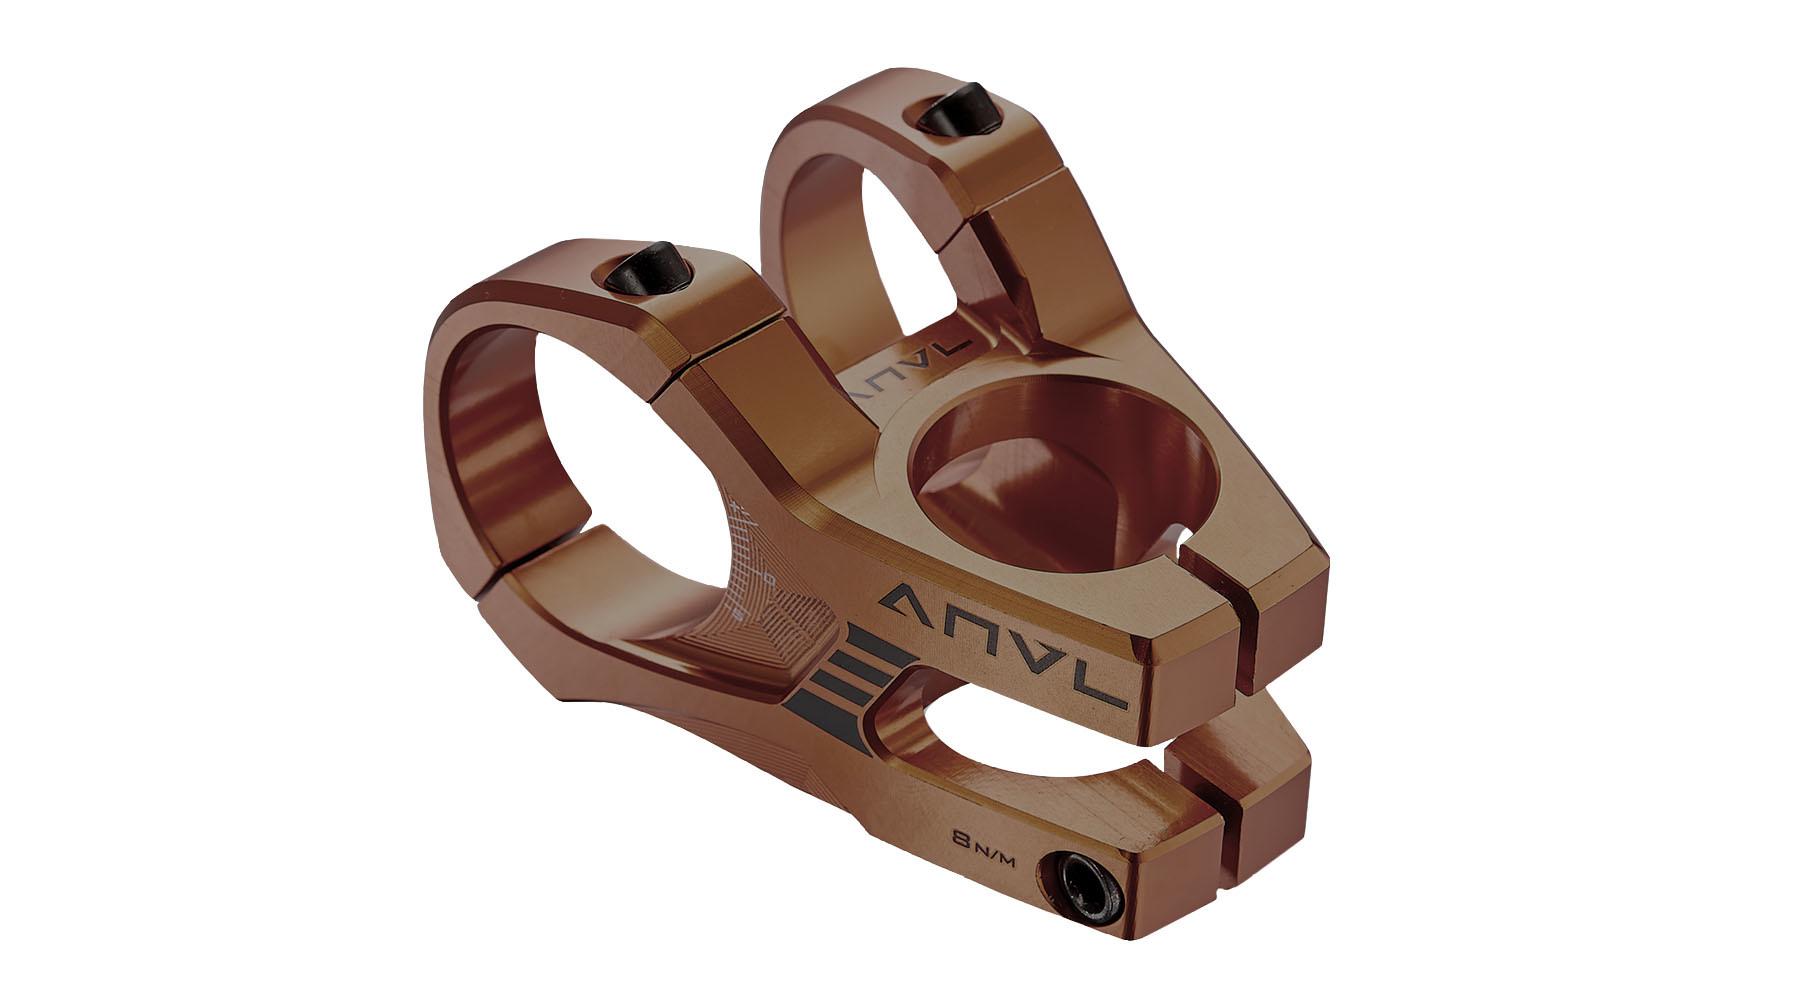 ANVL Components - Swage Stem (40mm, Bronze)